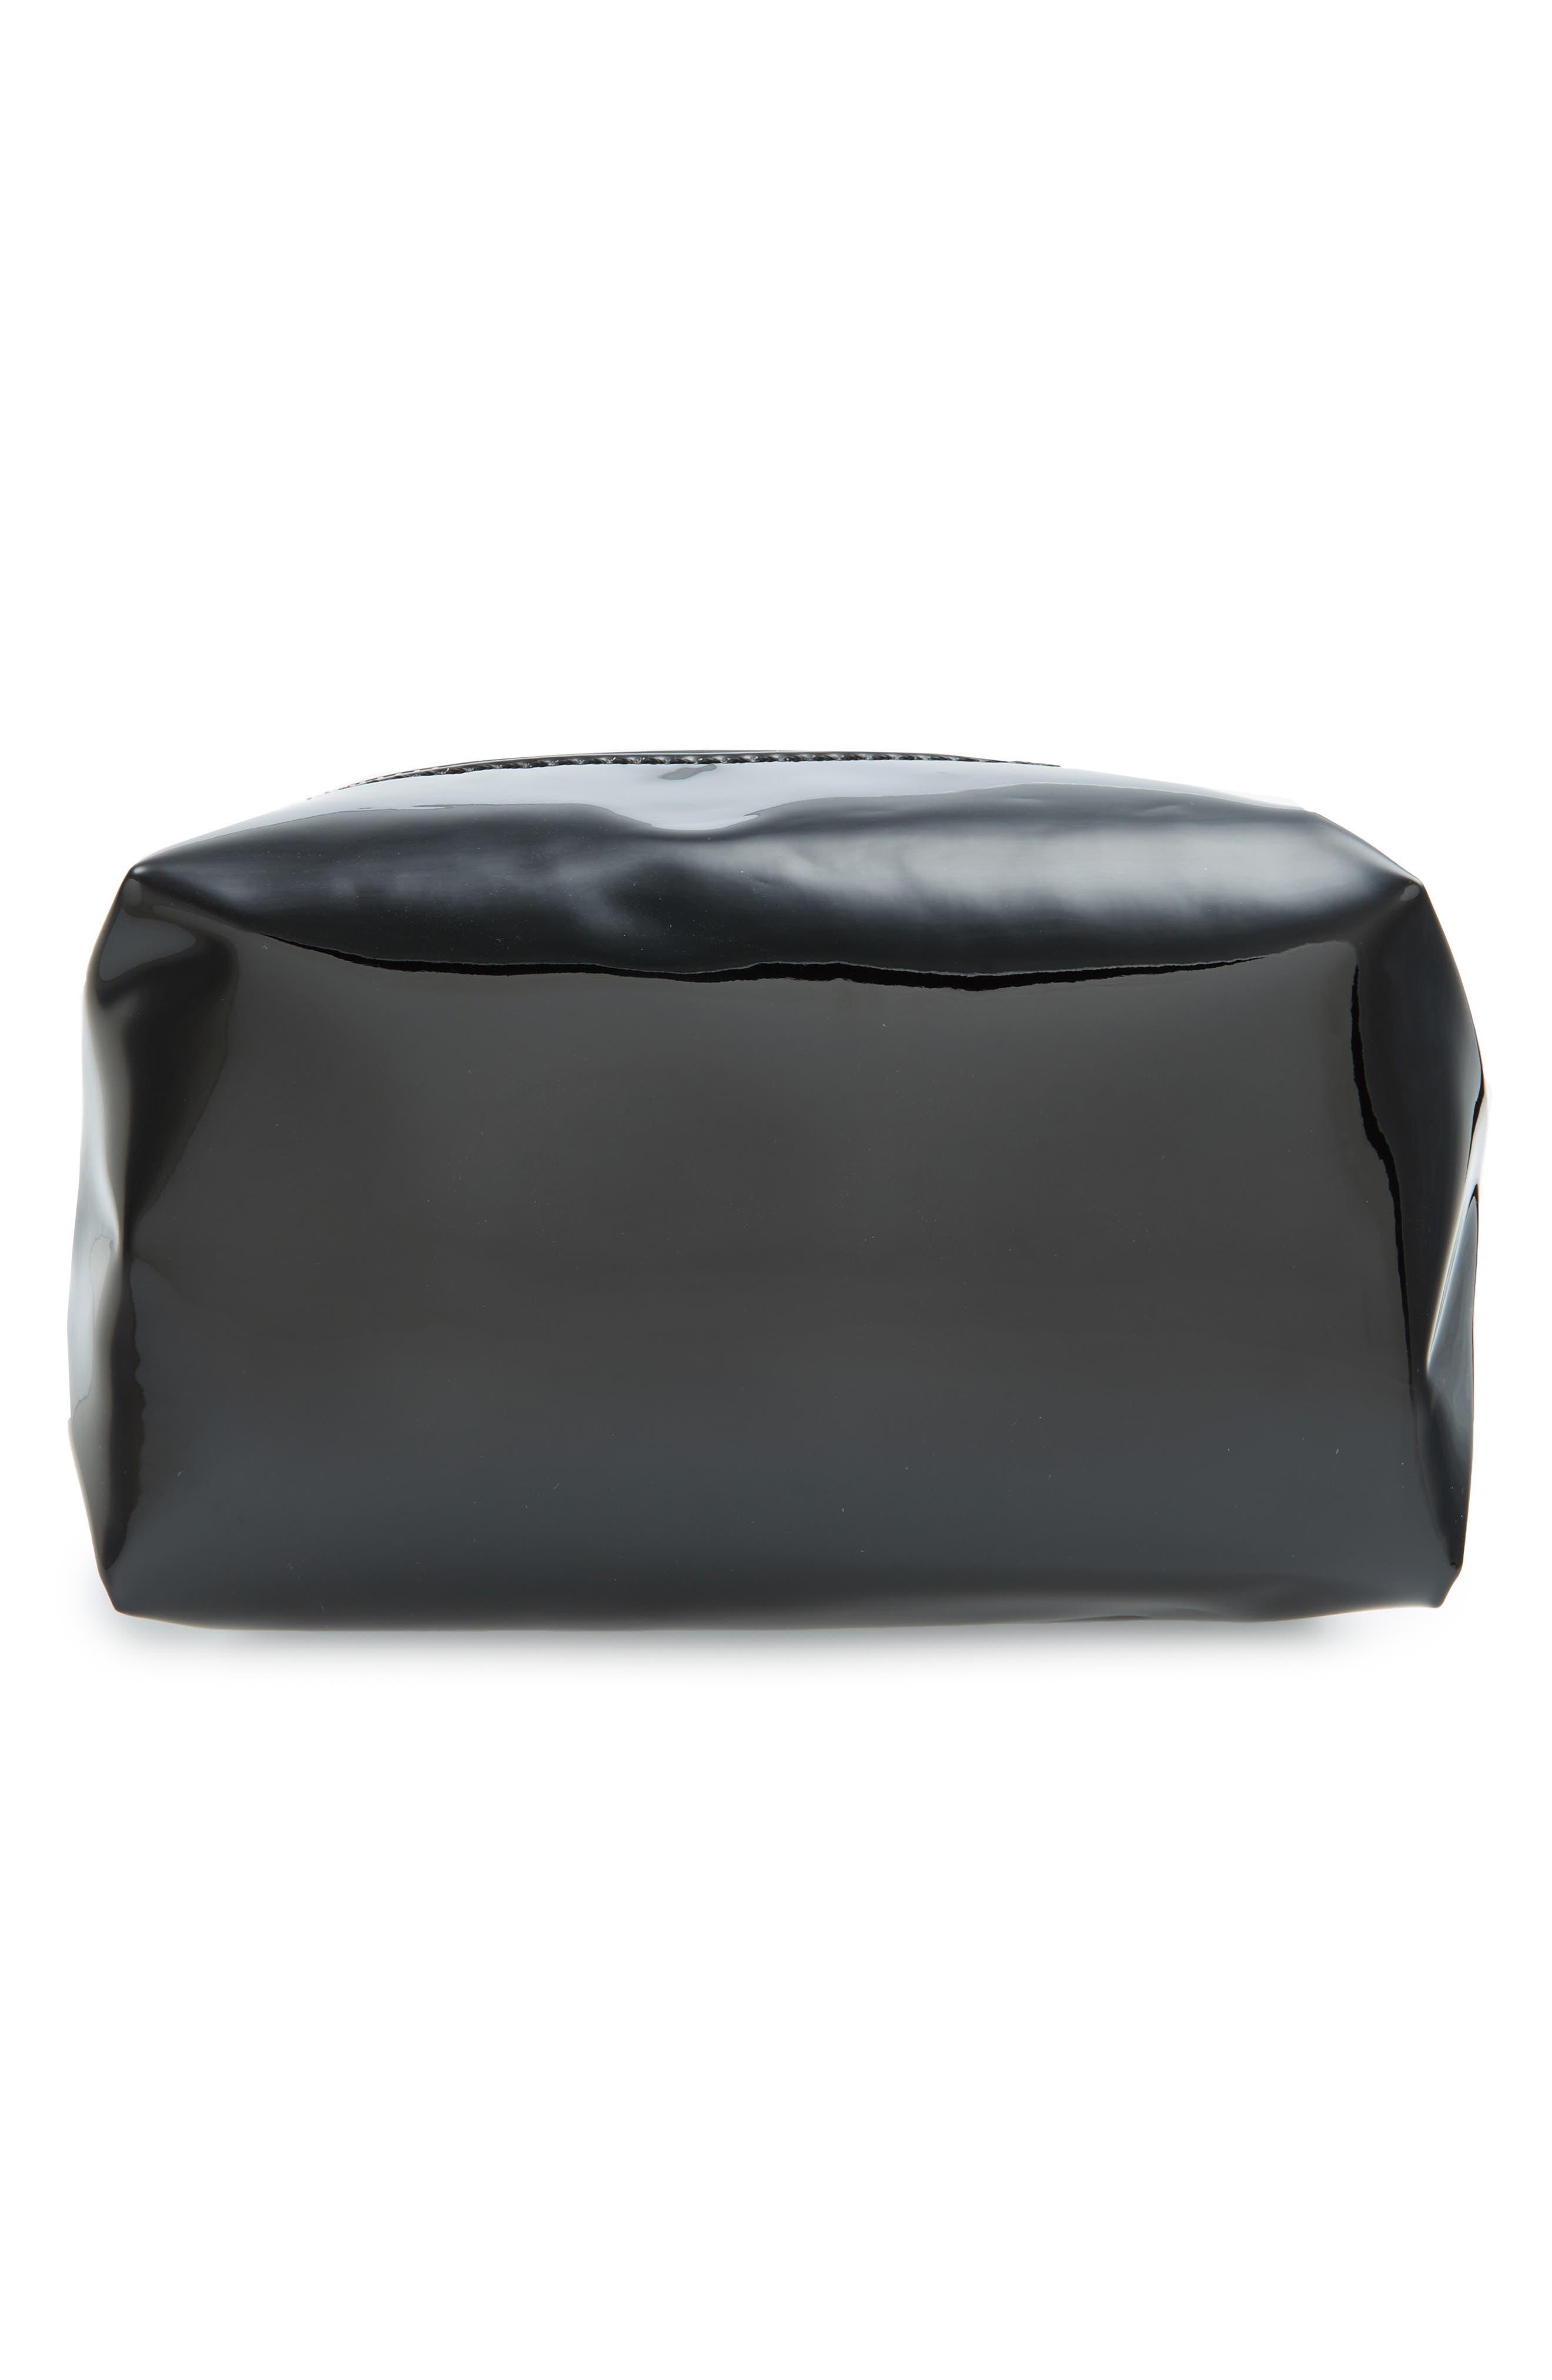 Metallic Cosmetics Bag,                         Main,                         color, 001